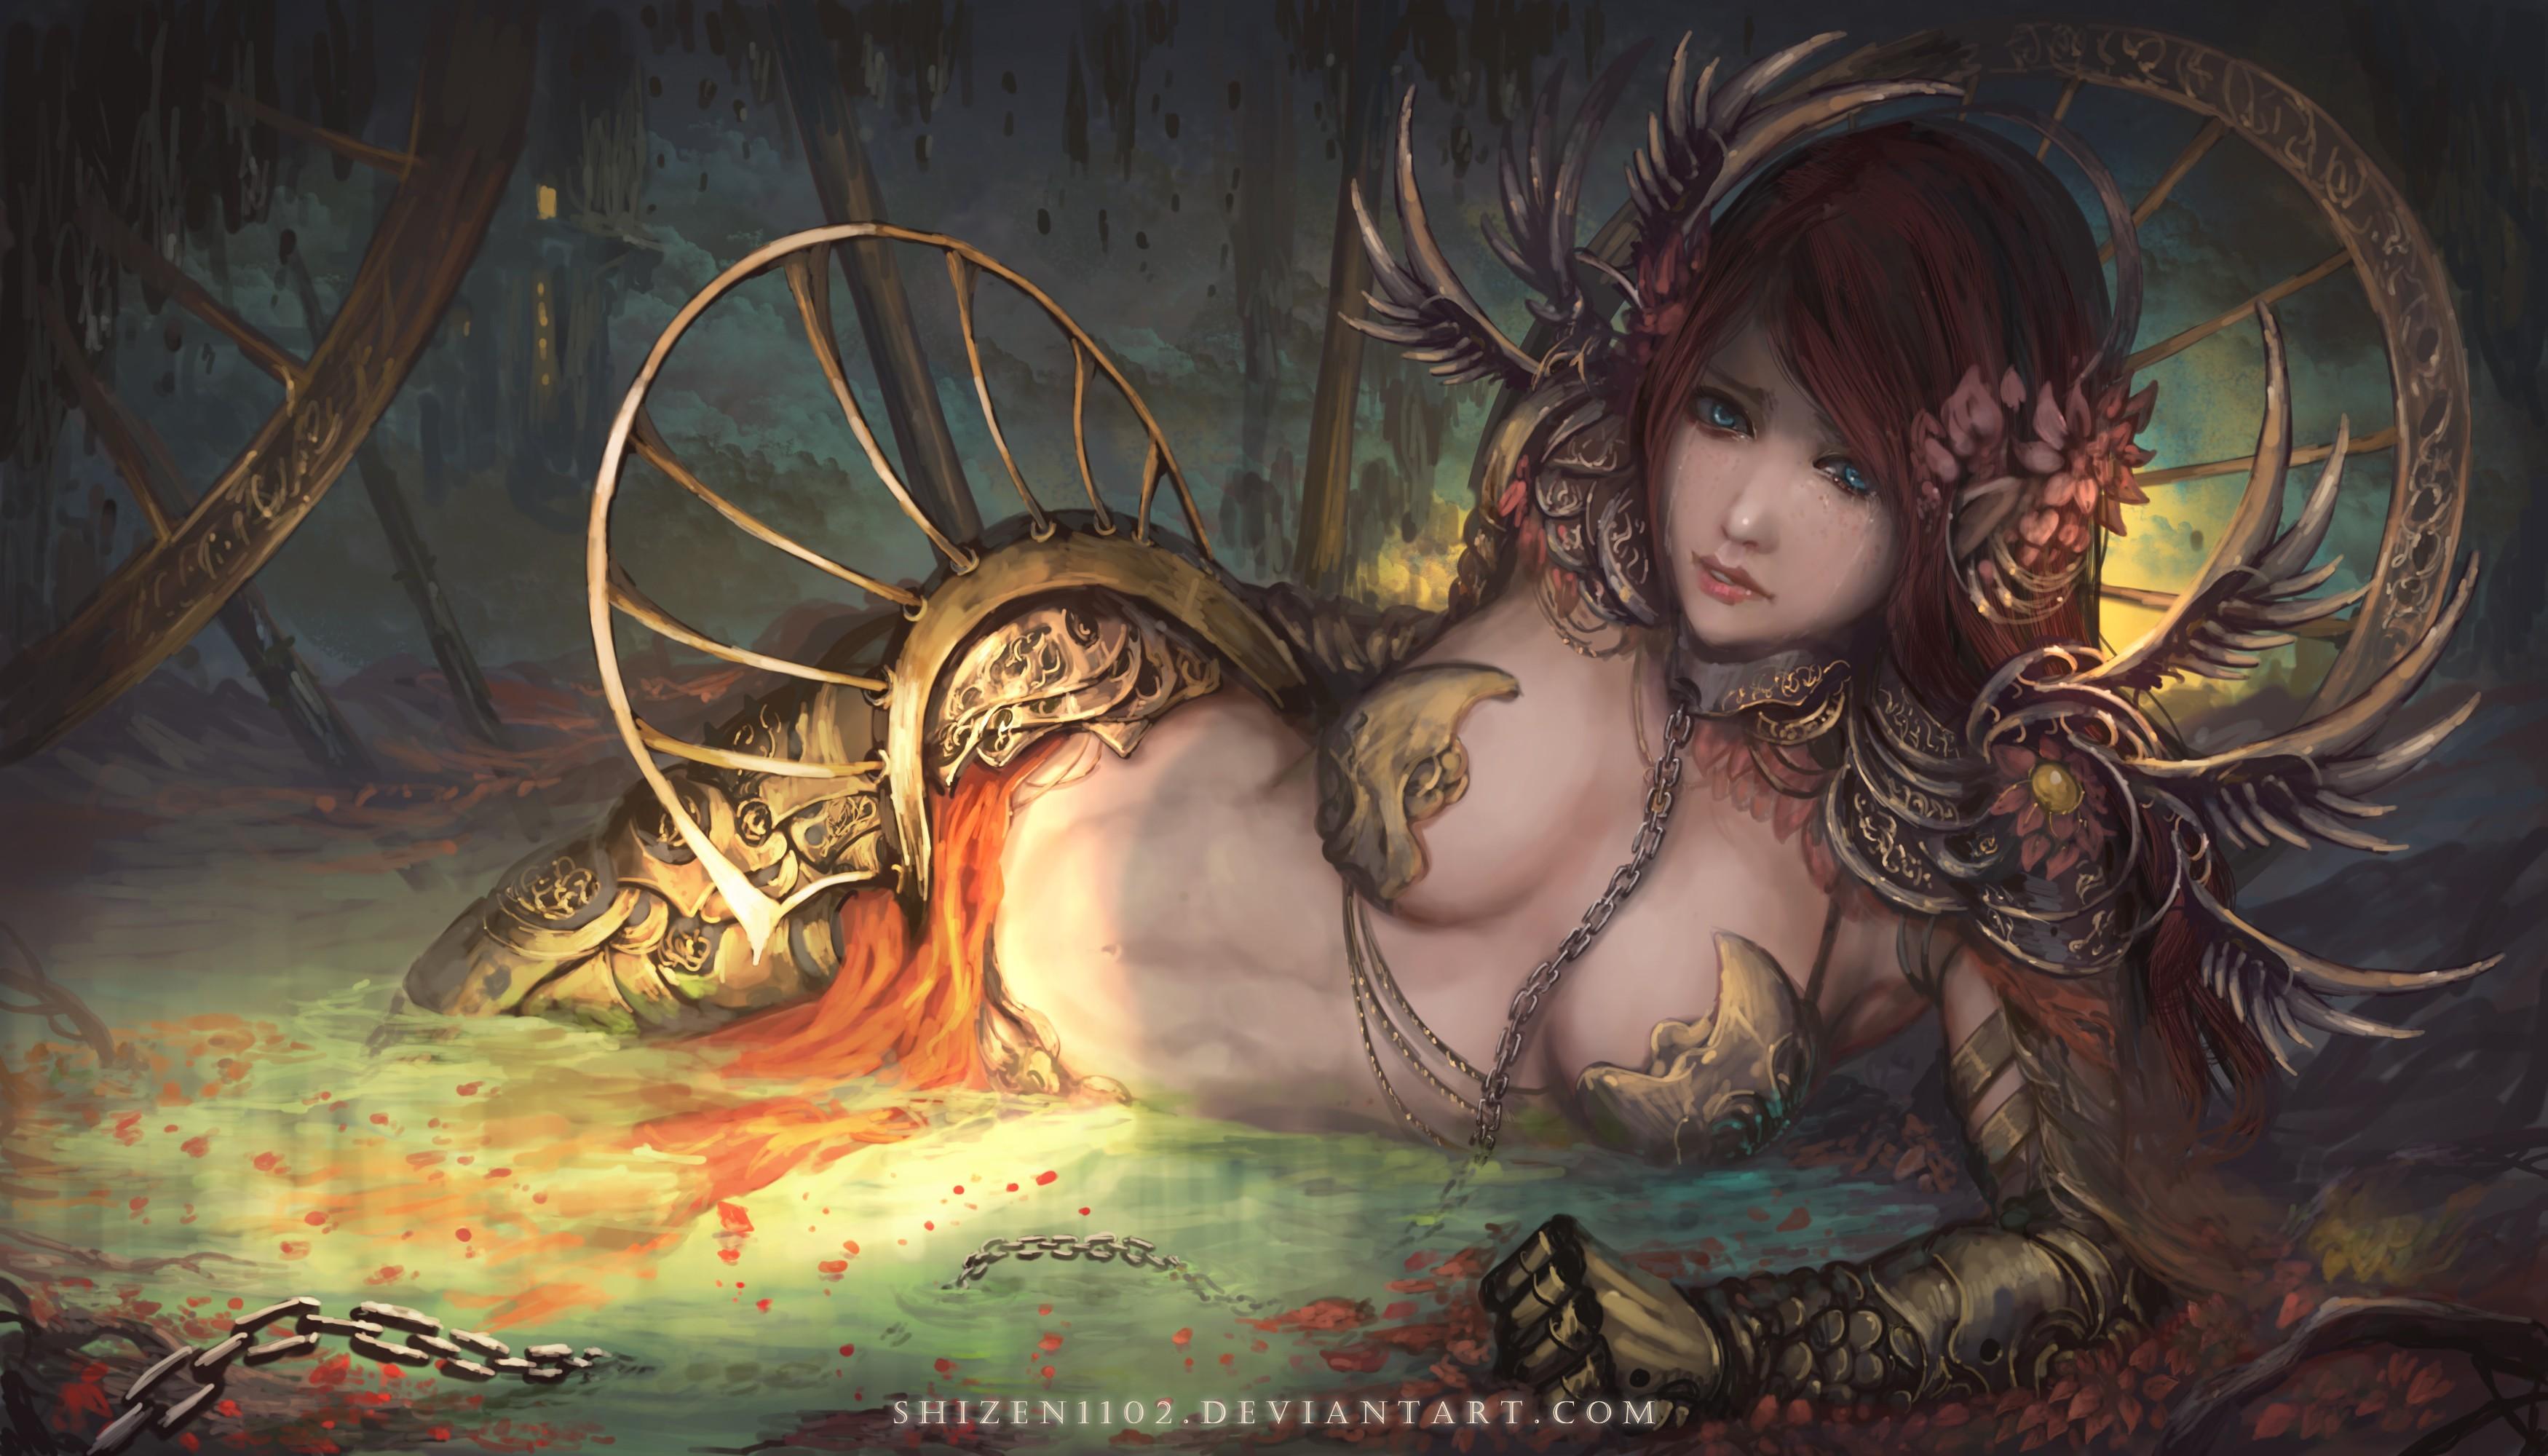 Game sensuality